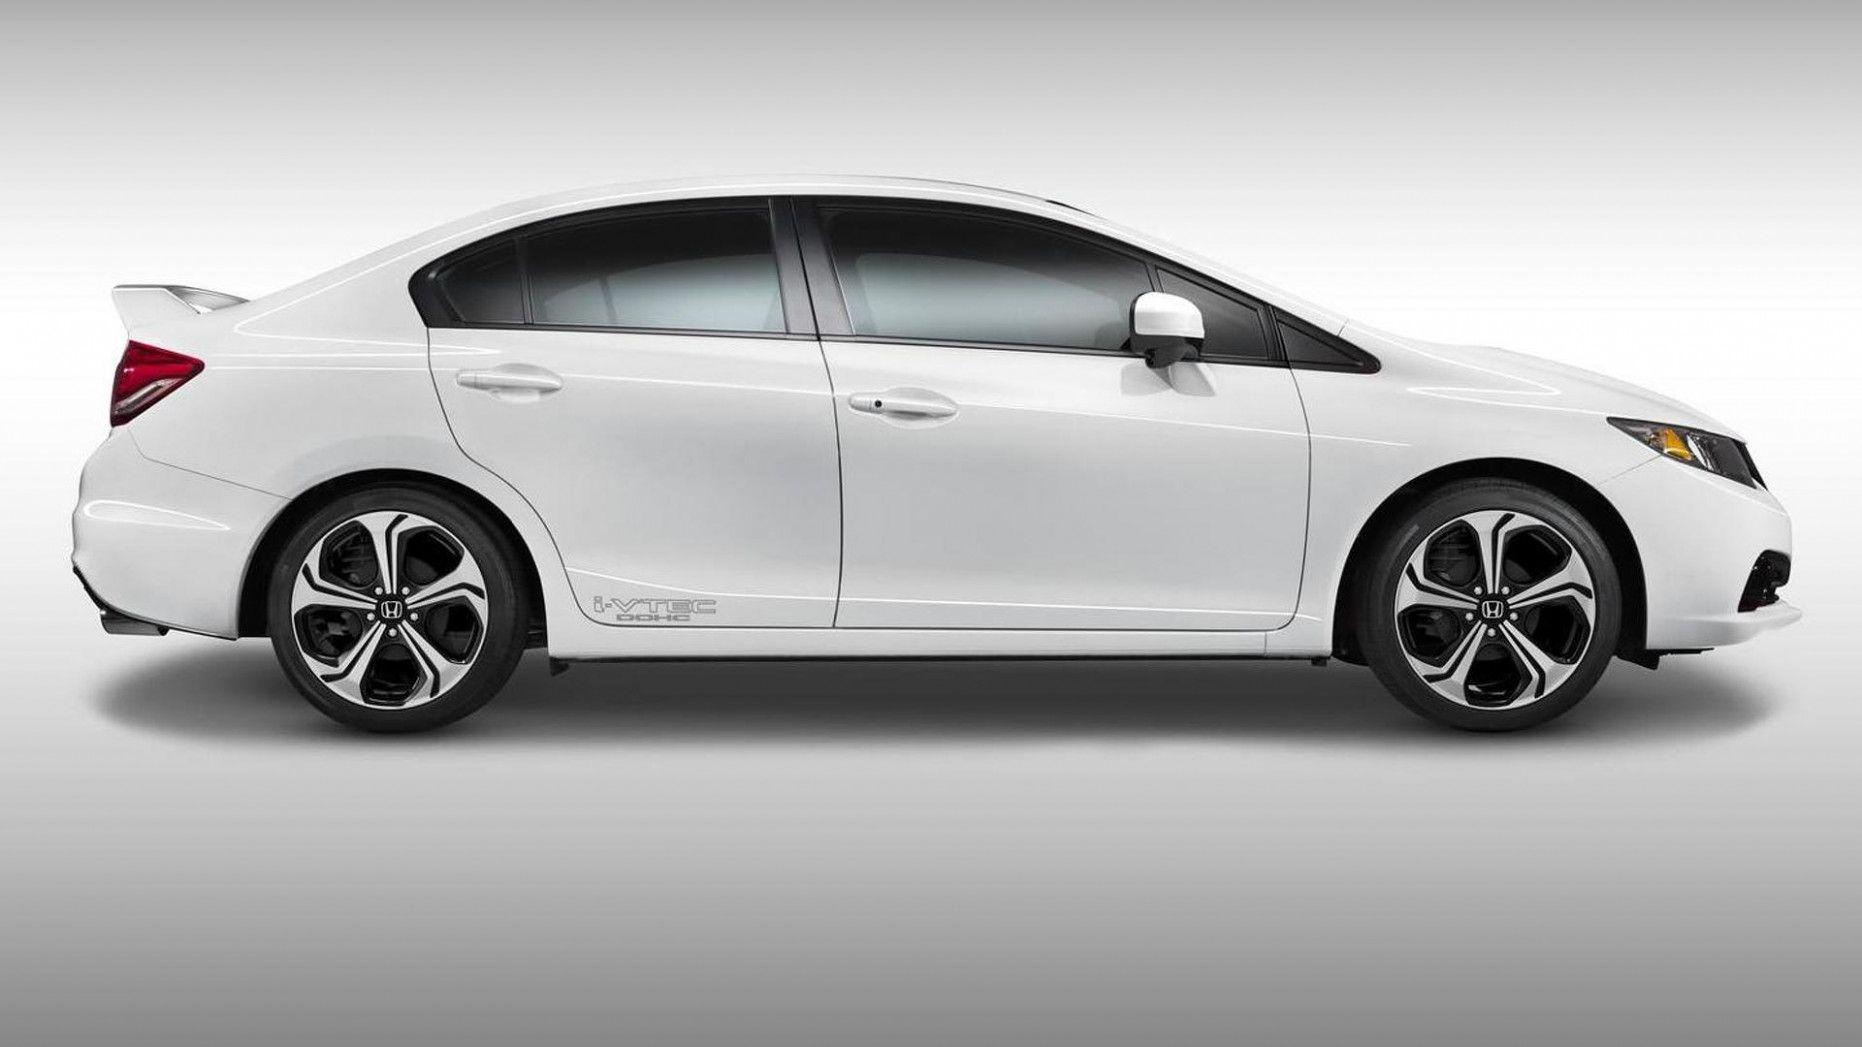 2015 Honda Civic Si For Sale Near Me Concept In 2020 2015 Honda Civic Honda Civic Si Honda Civic